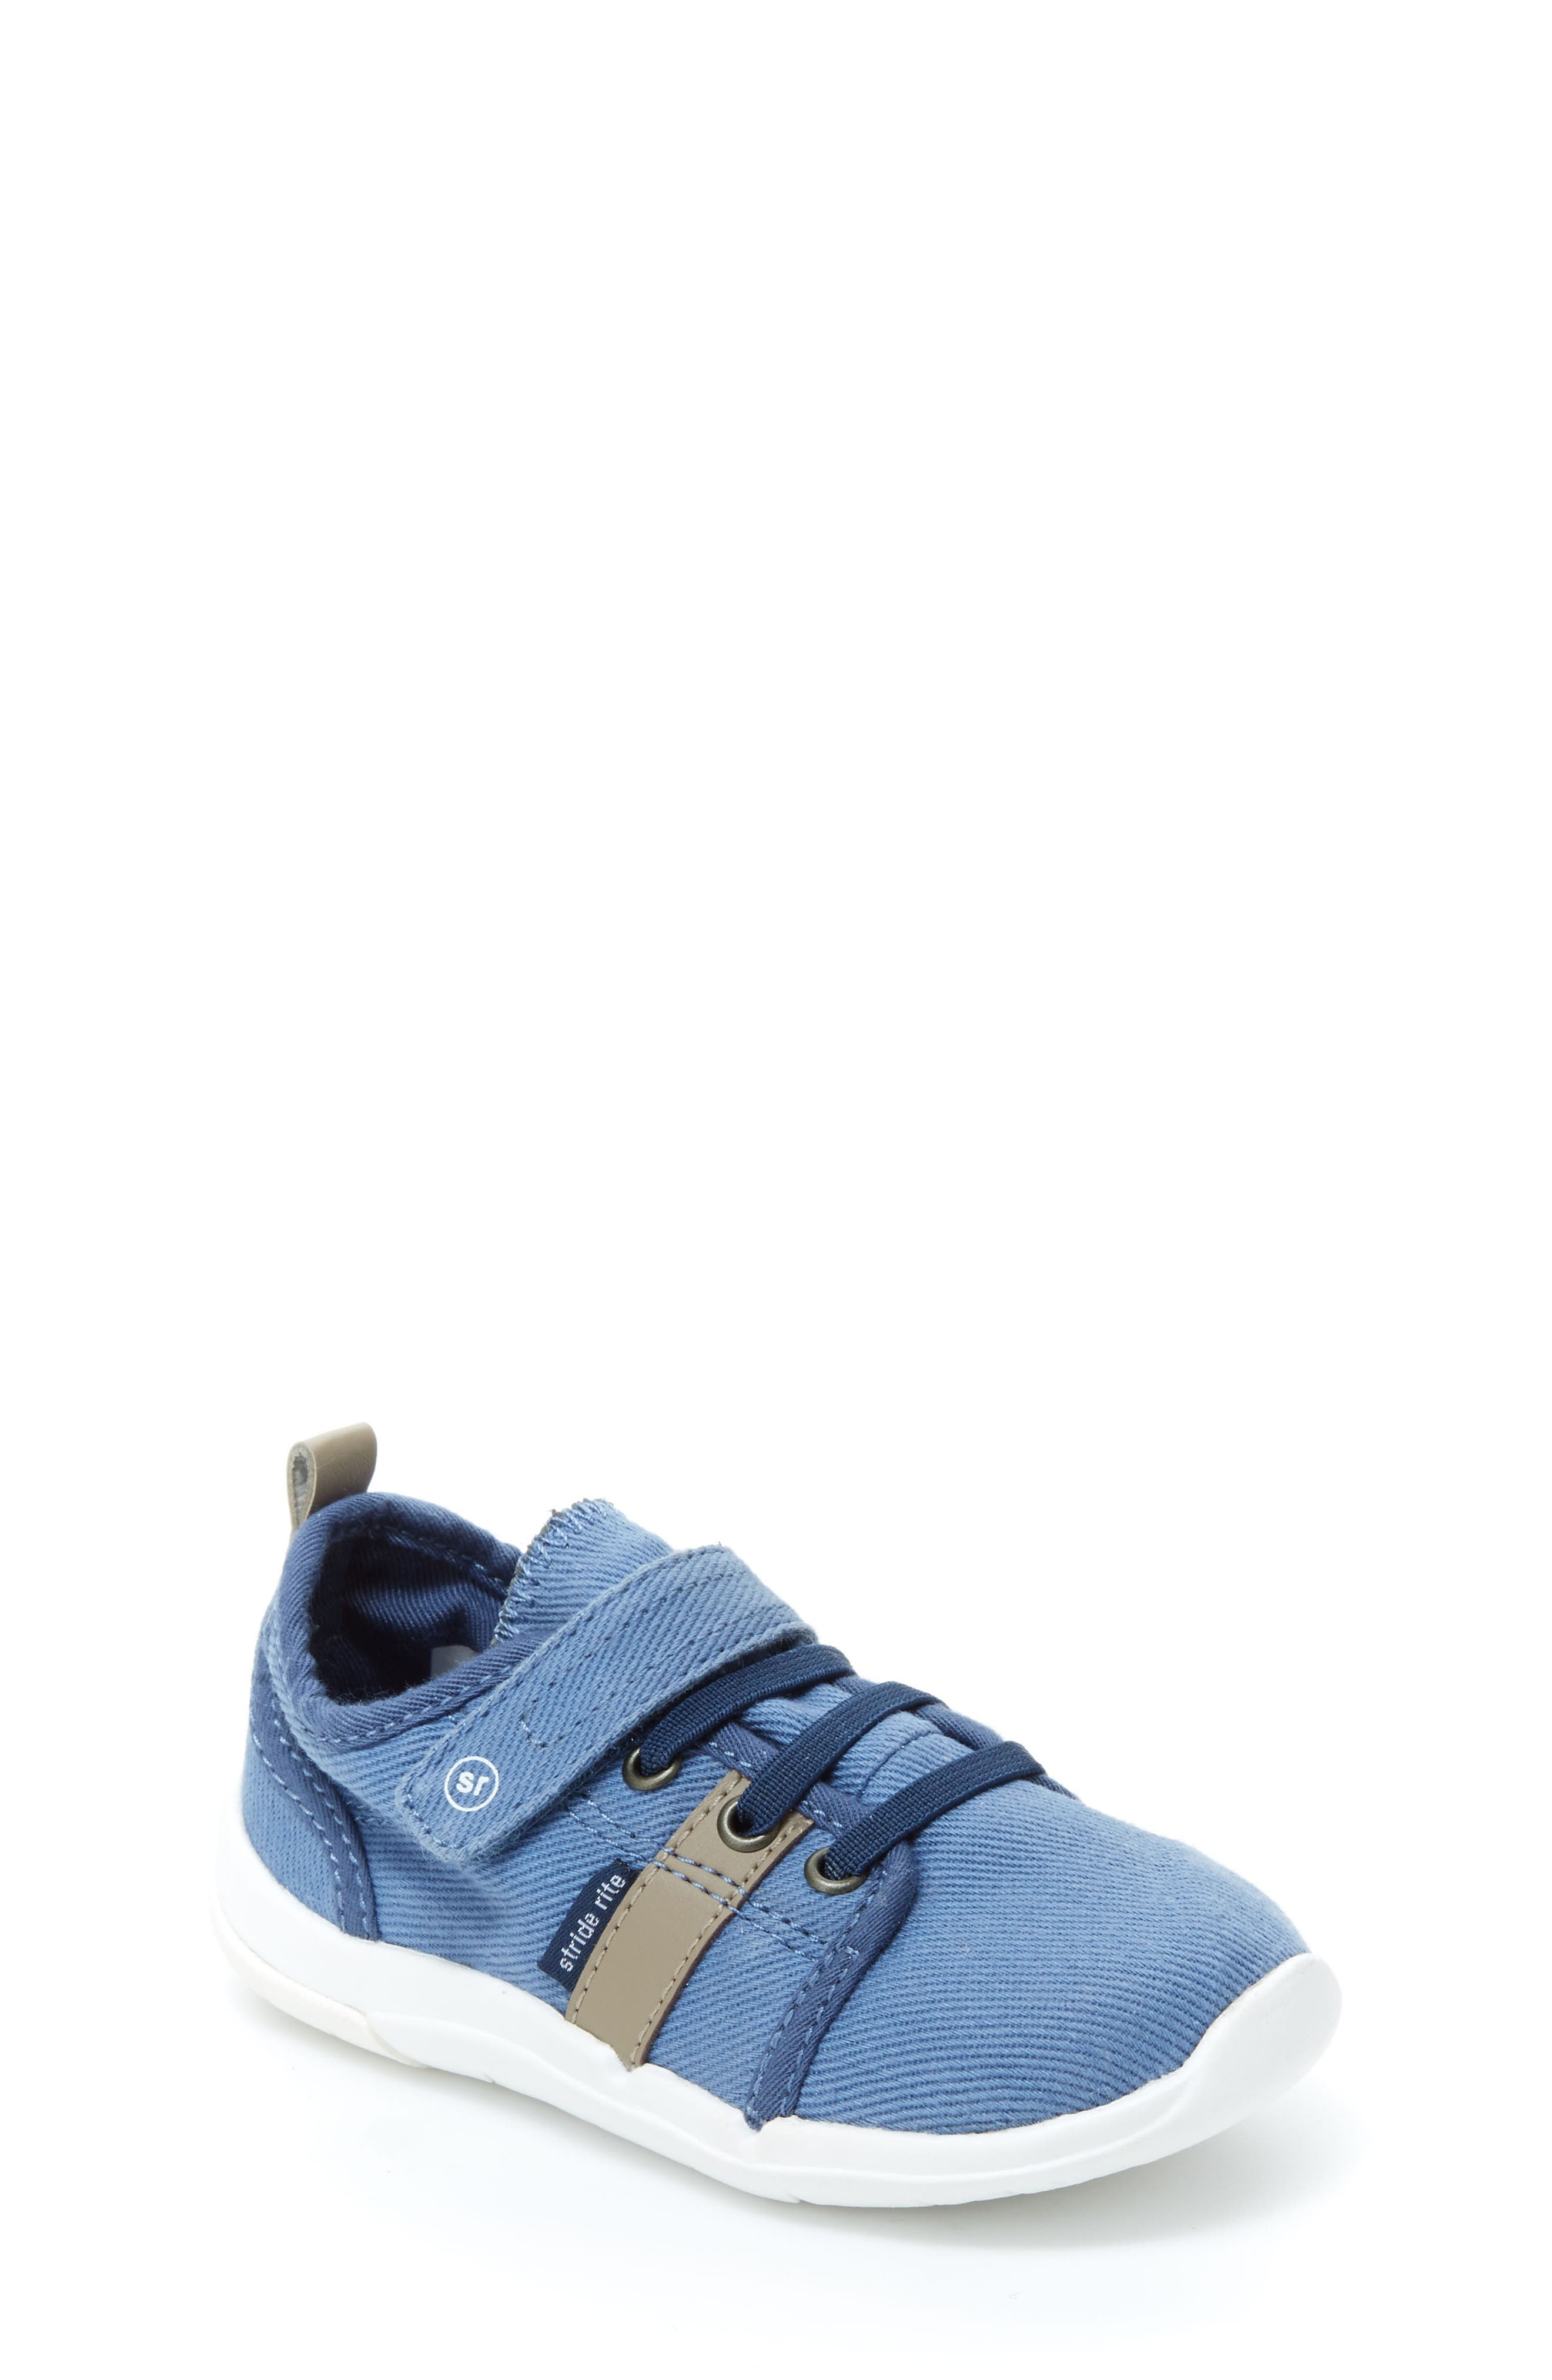 Dixon Sneaker,                         Main,                         color, 400